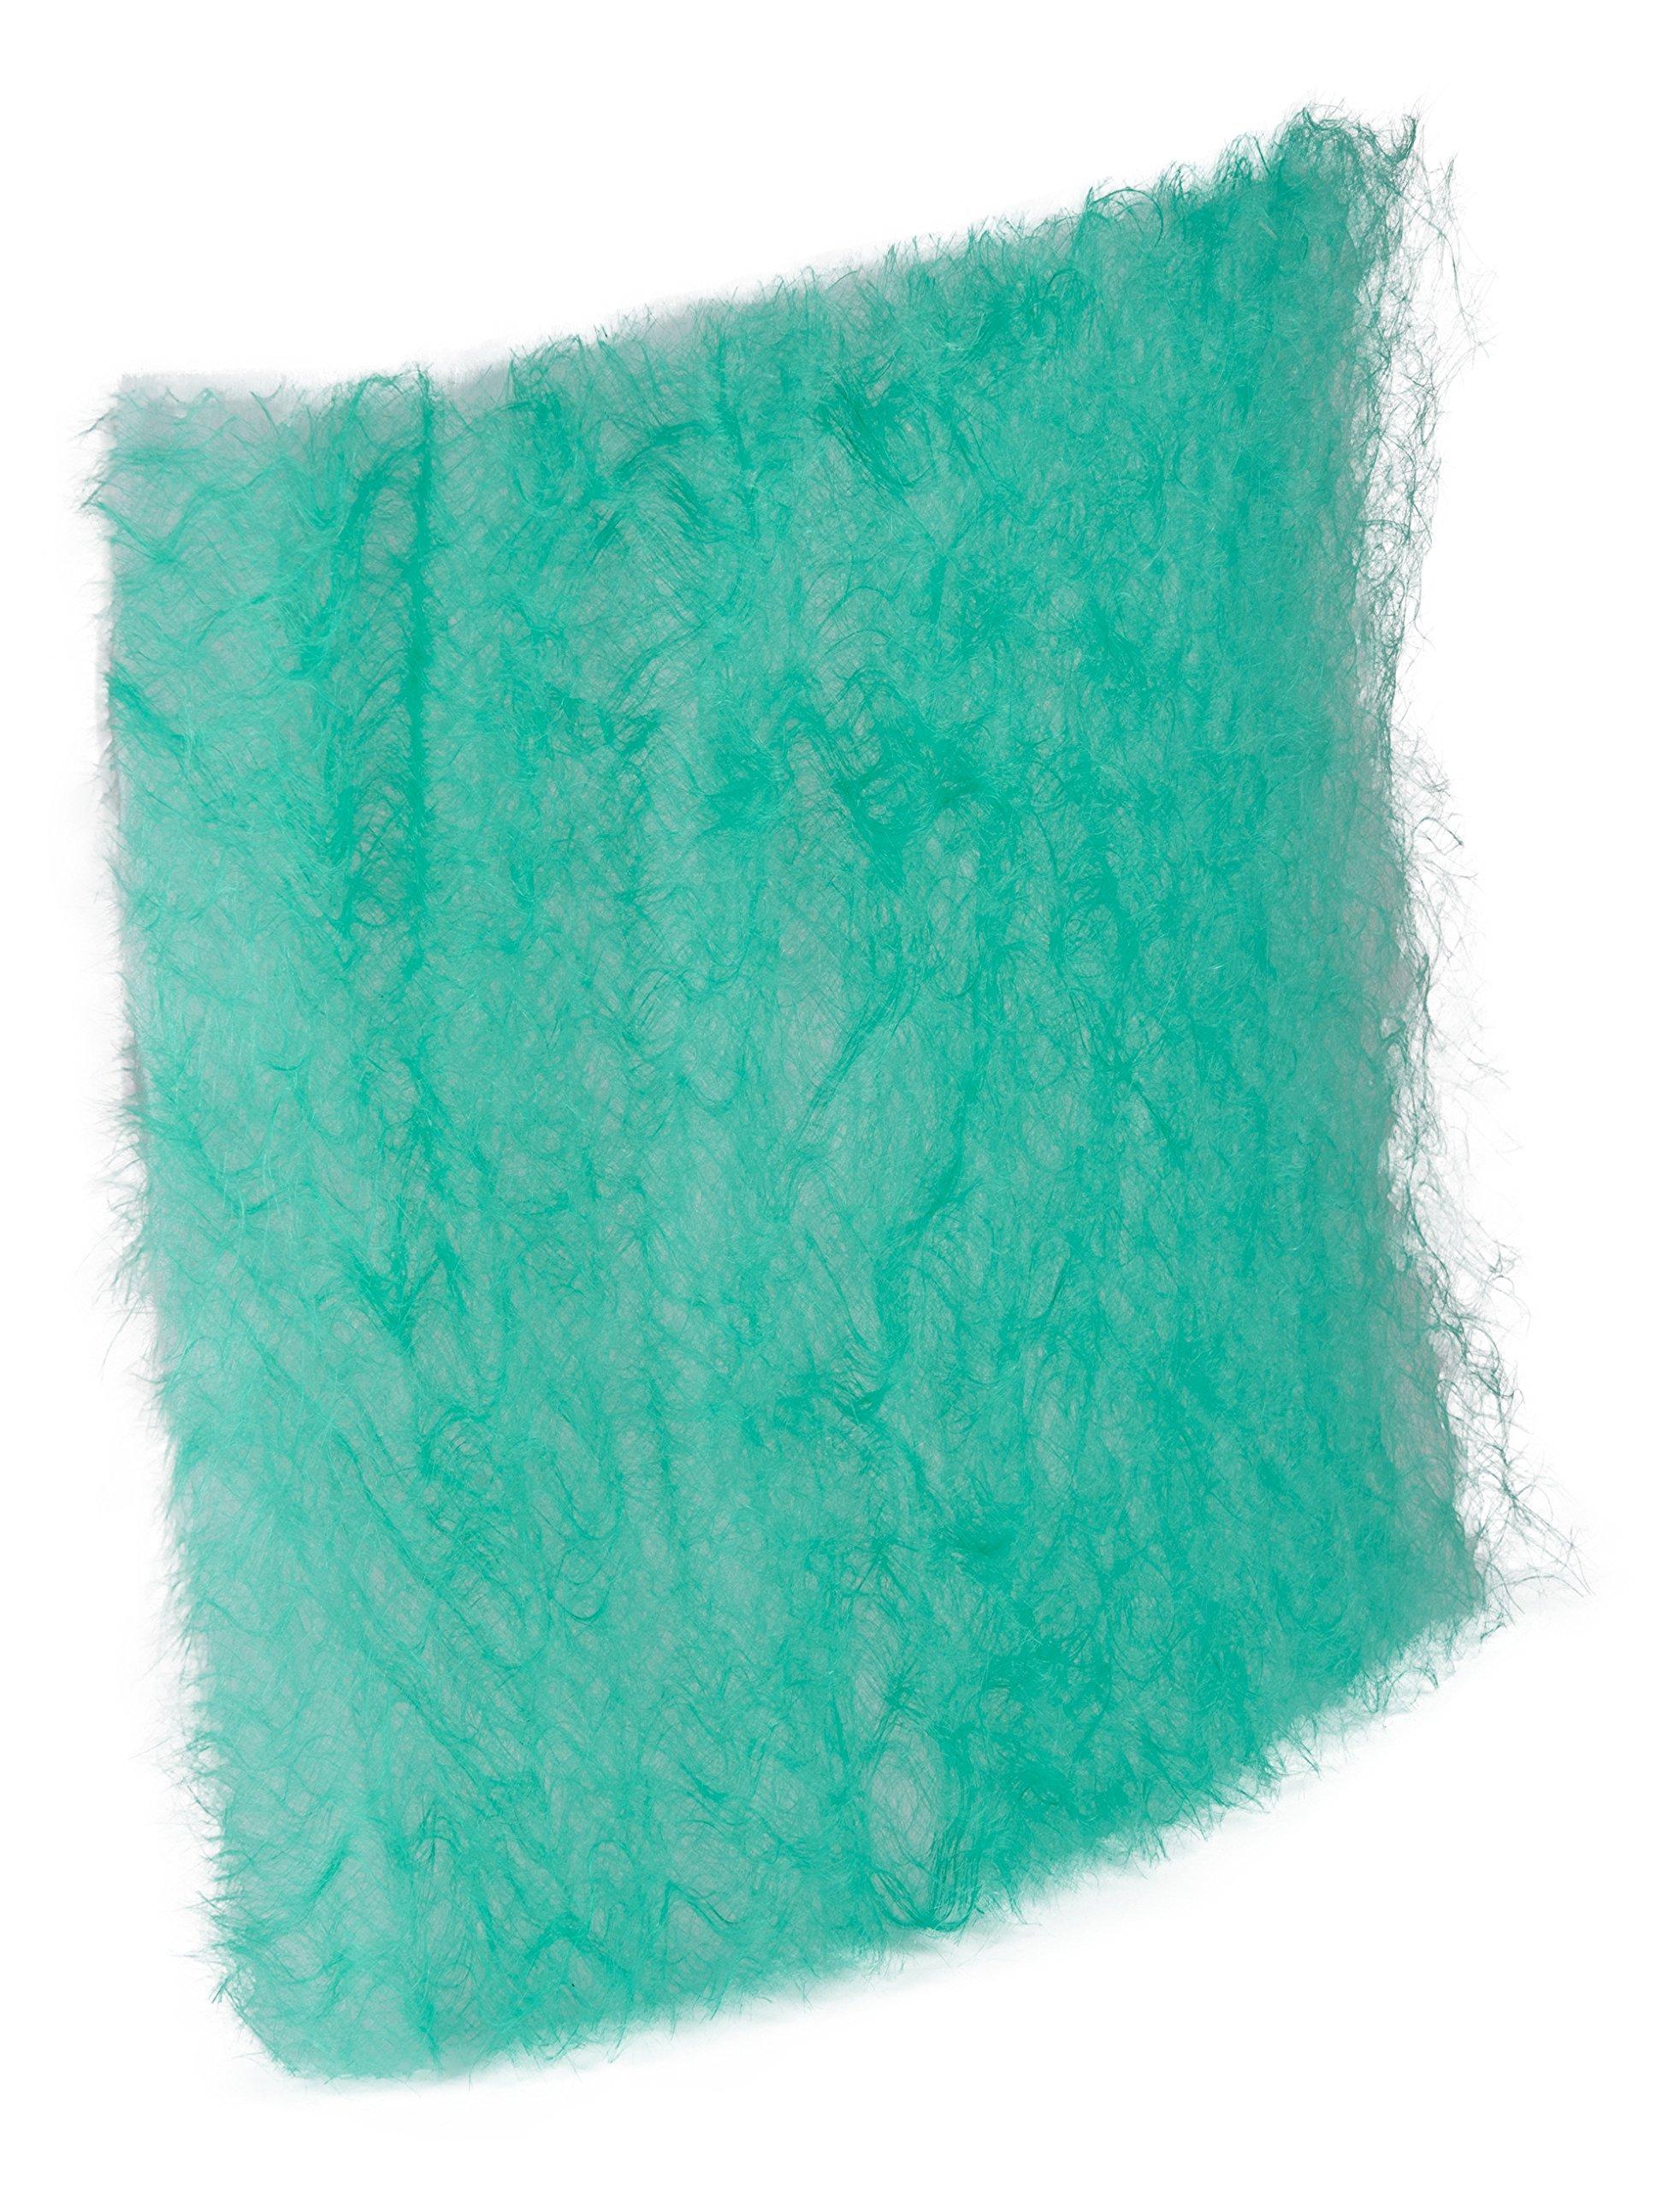 Chemco, 2020100HS2, 20''x20''x2'' HS-2 Fiberglass Paint Arrestor Pads 100/Box